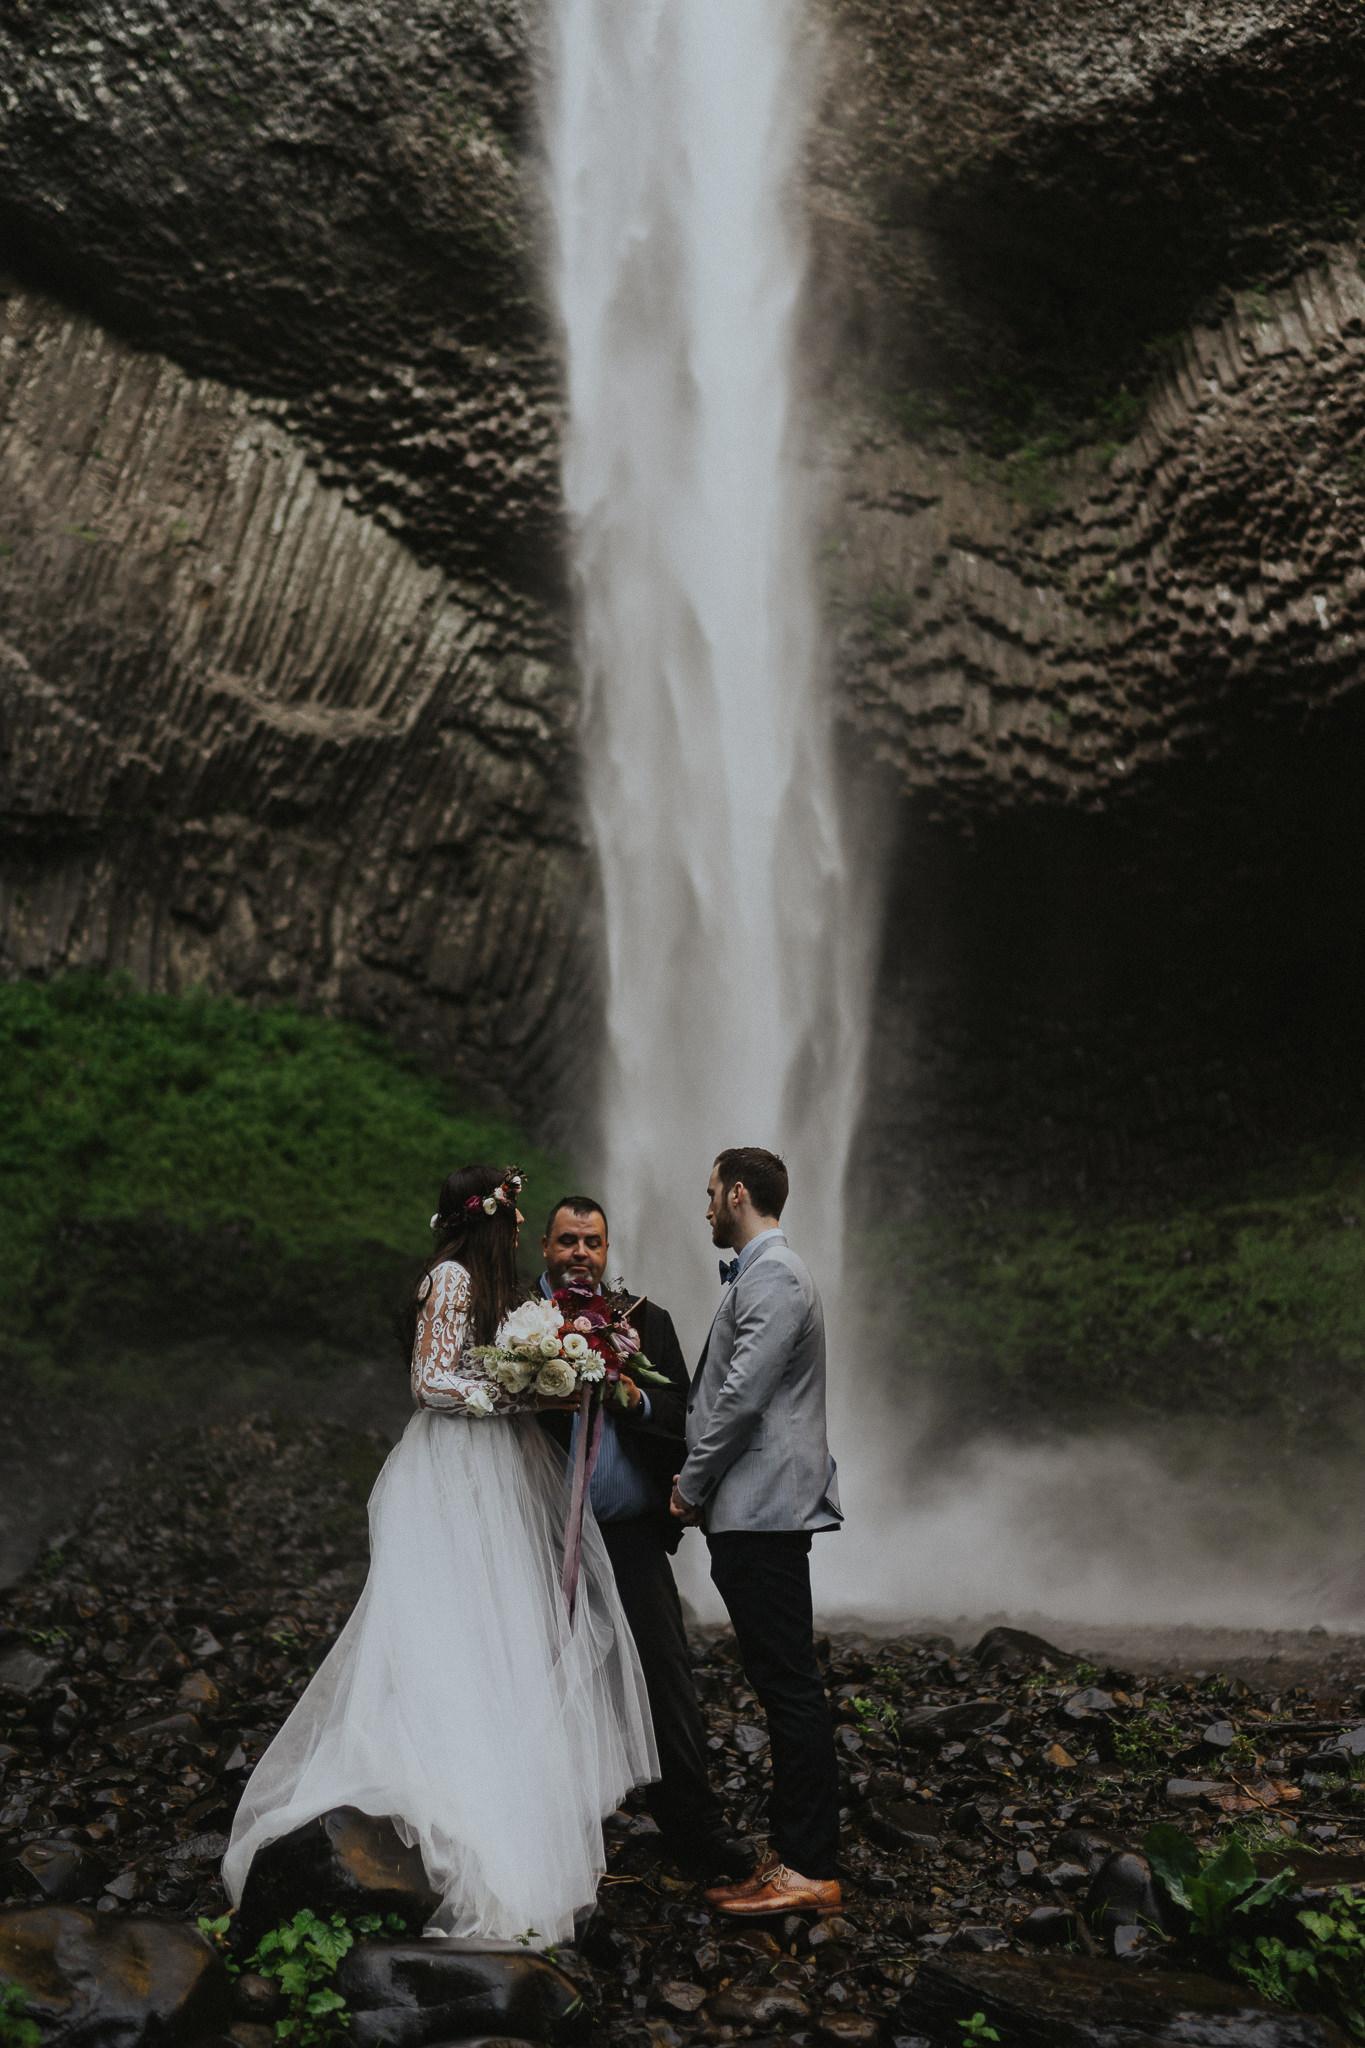 Chasing-Waterfalls-Elopement-wedding-Photographer